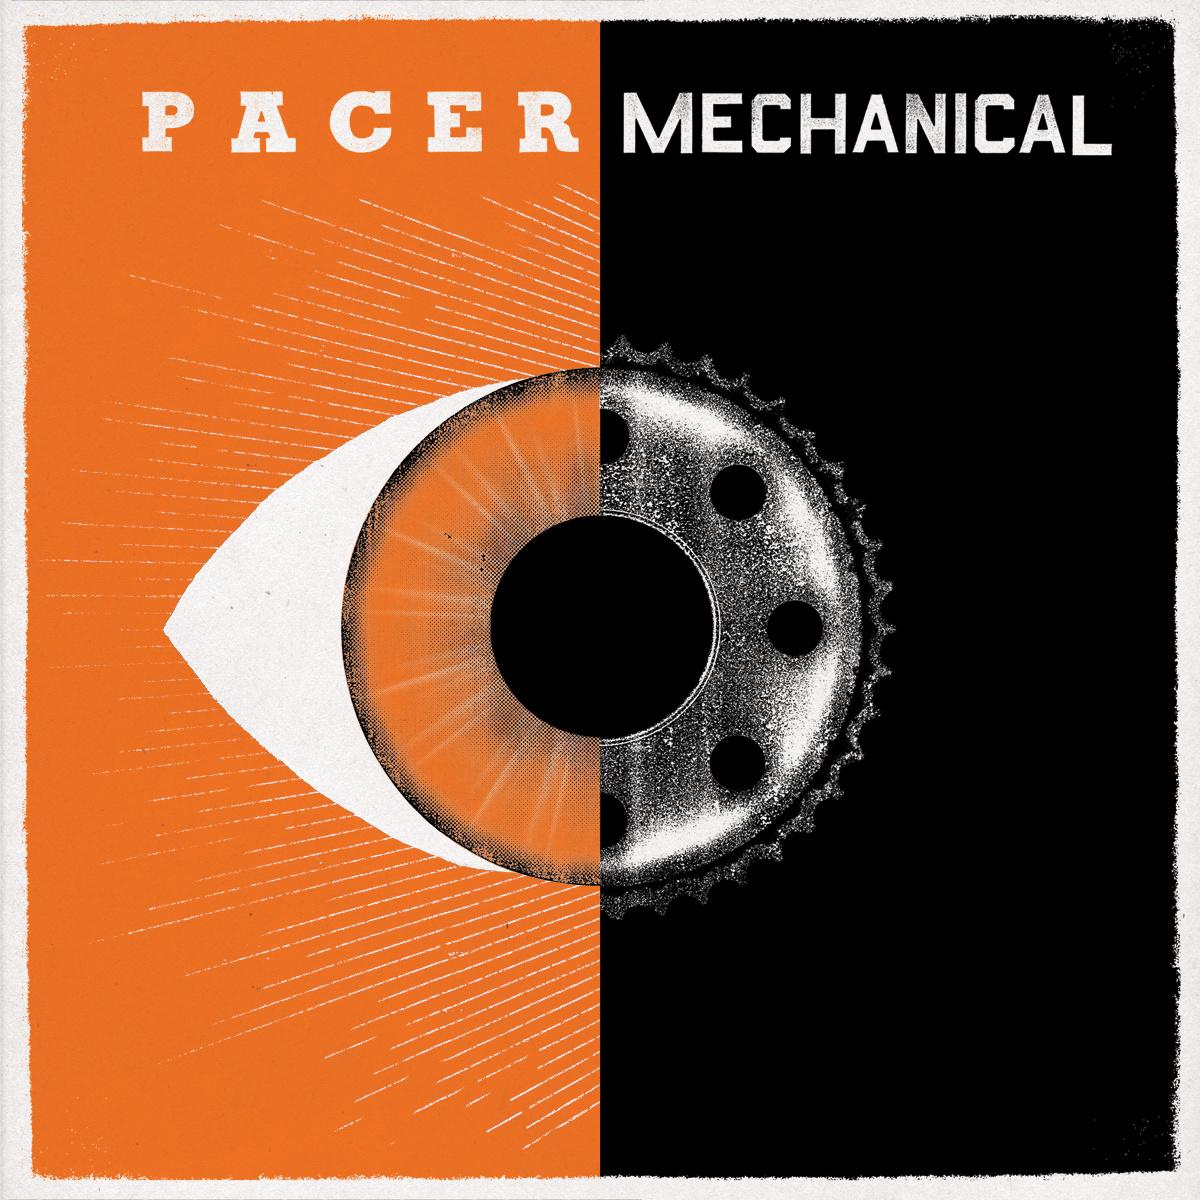 Pacer - Mechanical LP / CD